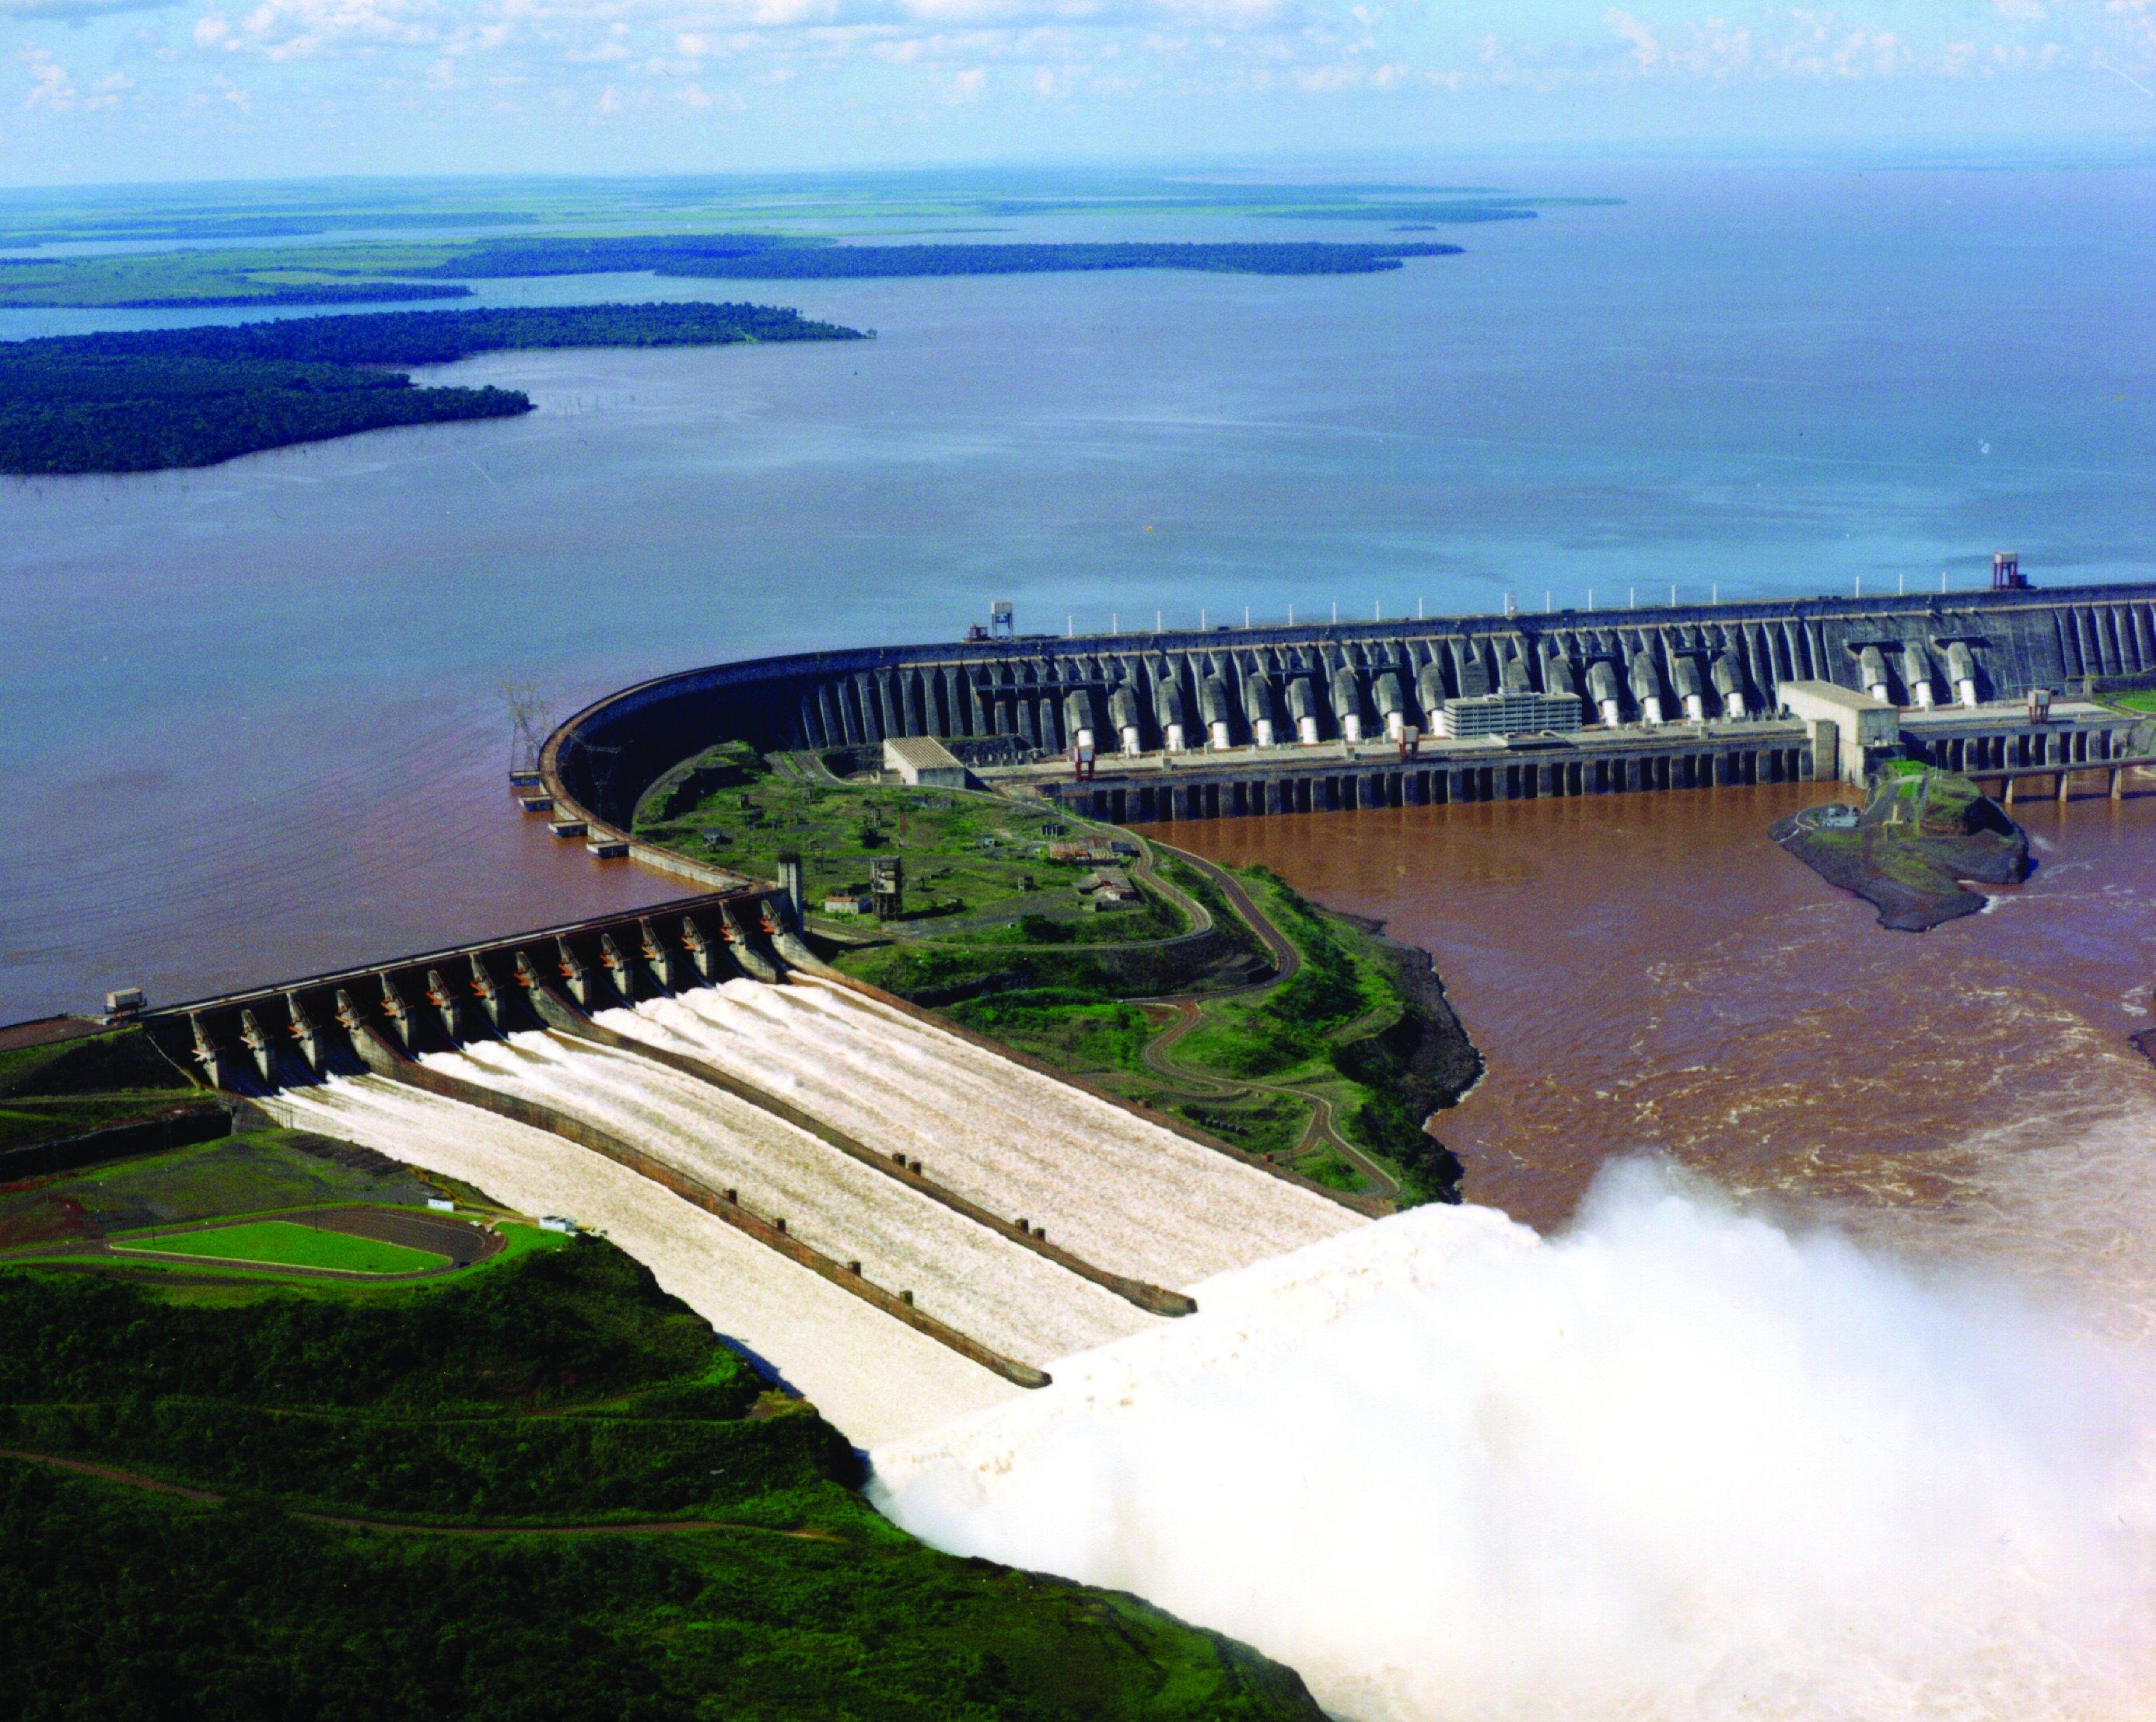 ciudad-del-este-usina-Itaipu-binacional-Cataratas-yguazu-turistas-verano-turismo